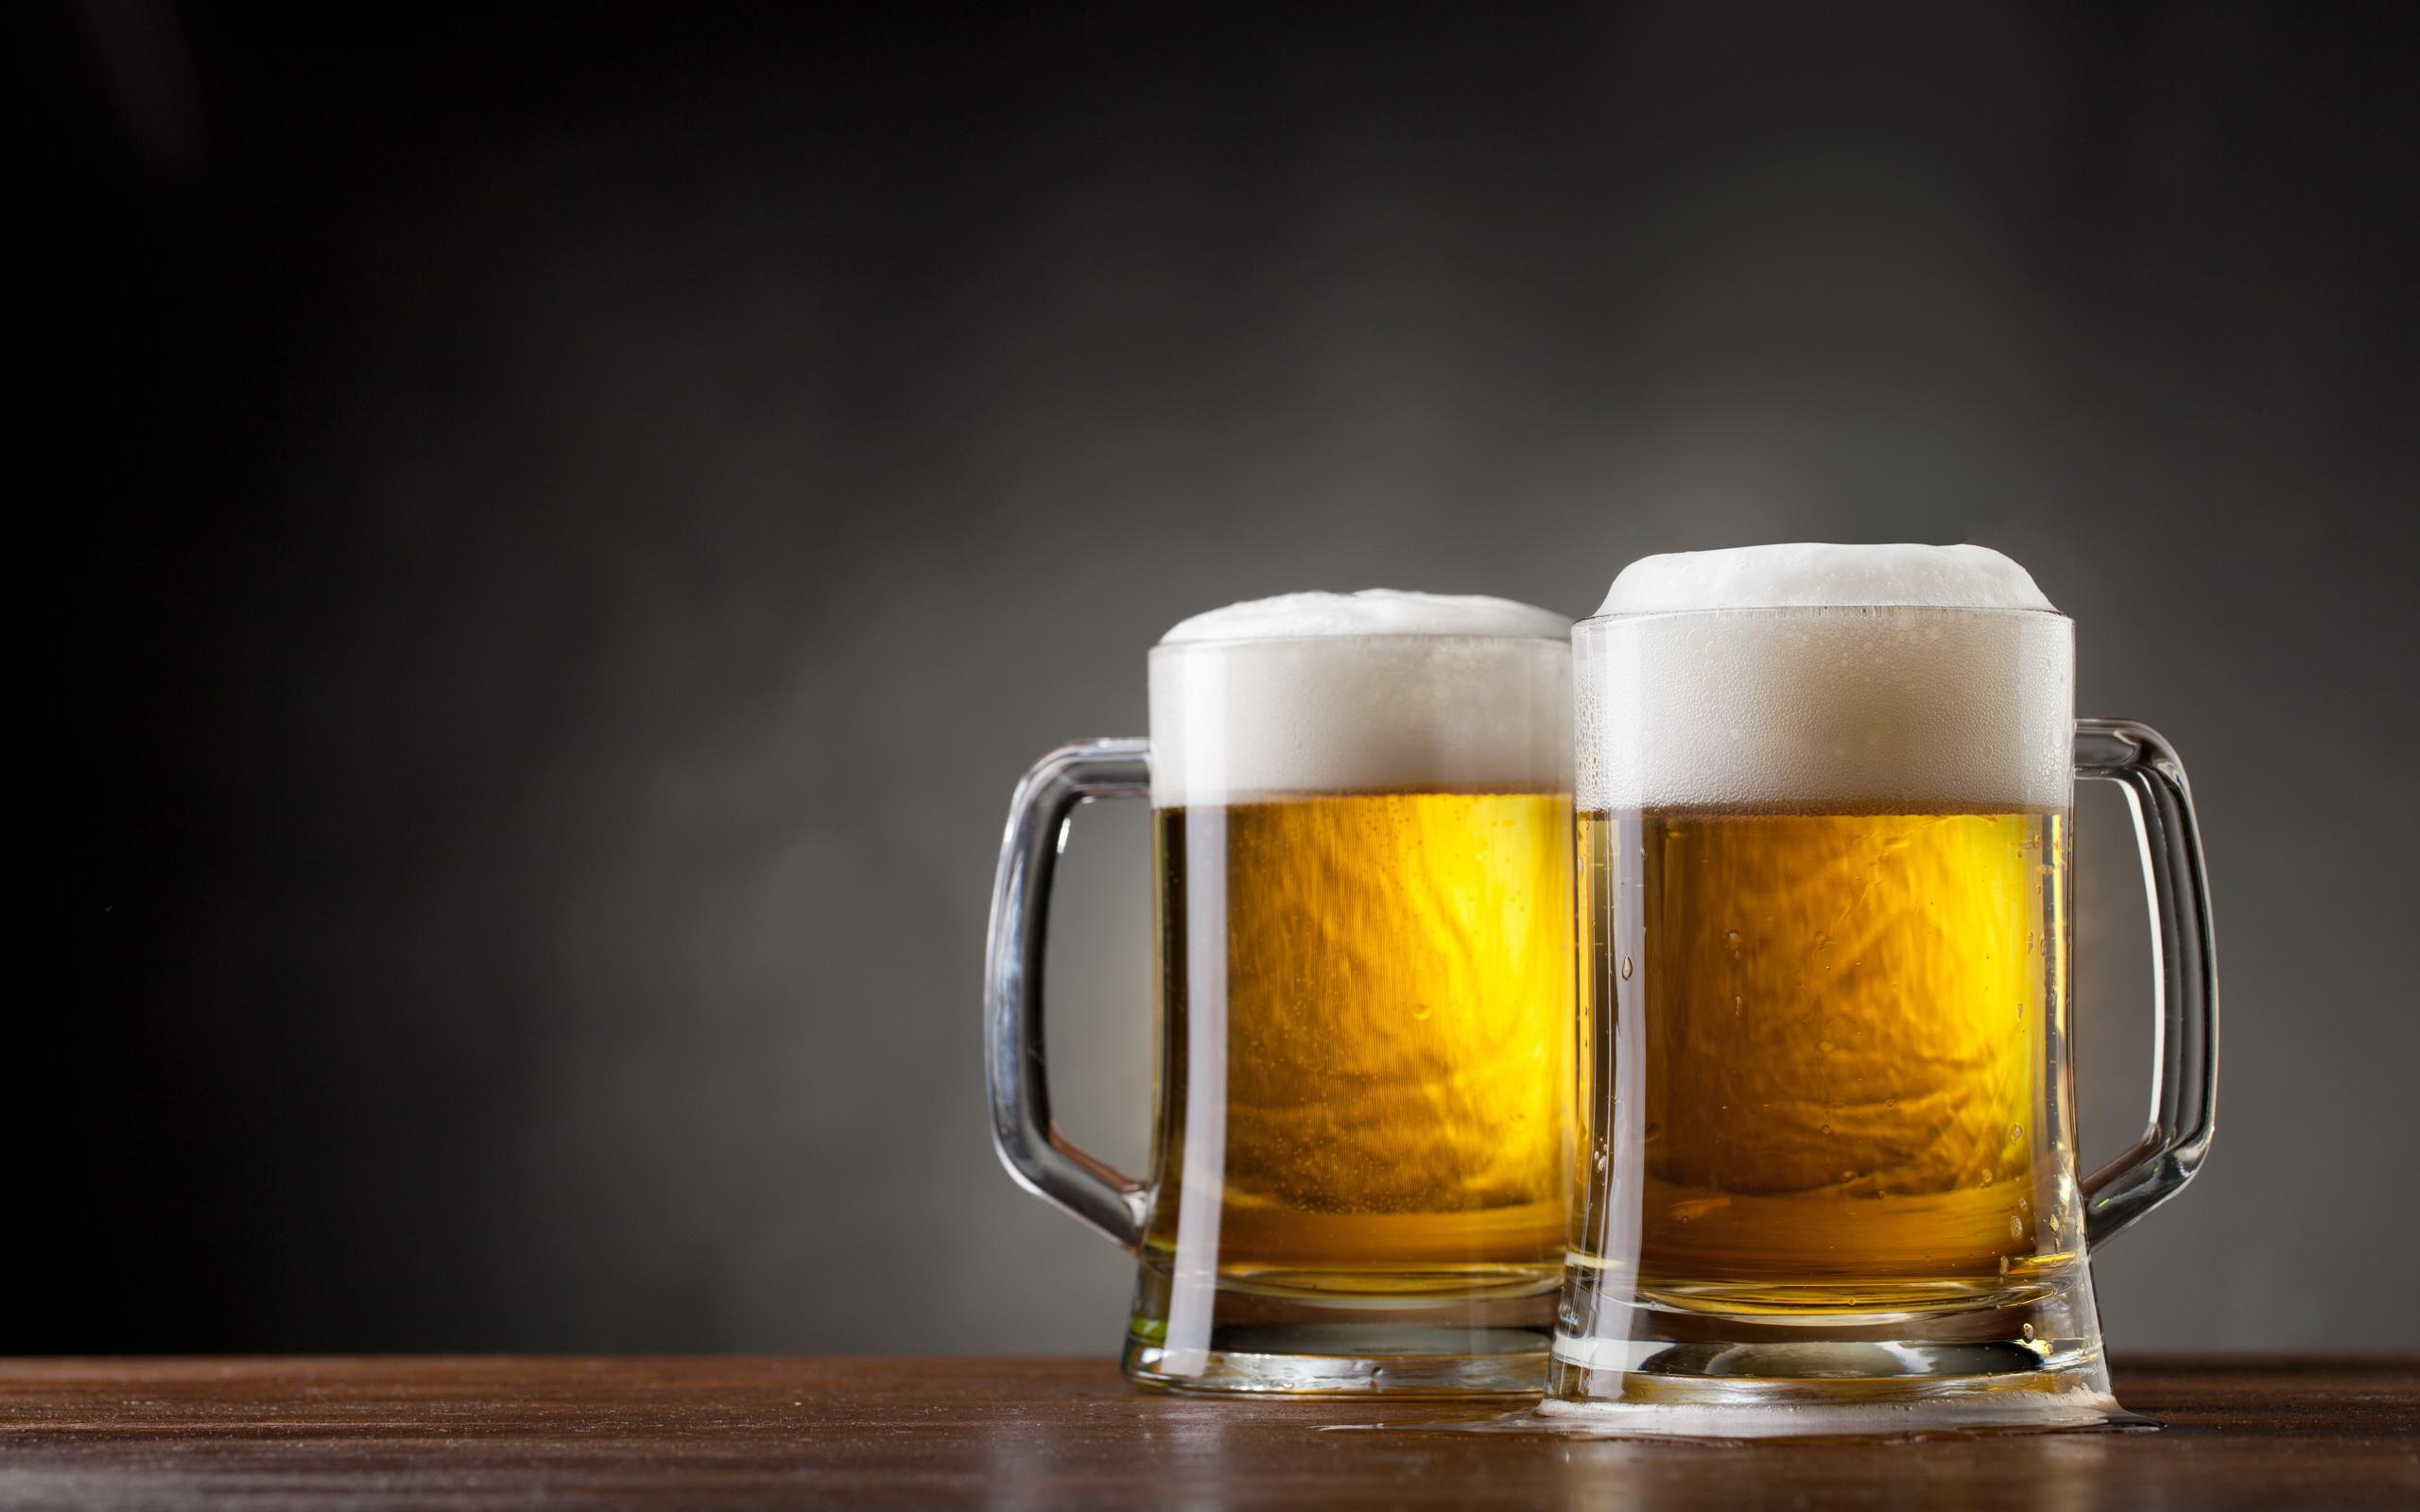 Atención caballeros: Beber cerveza ayudaría ¿a salvar sus matrimonios?